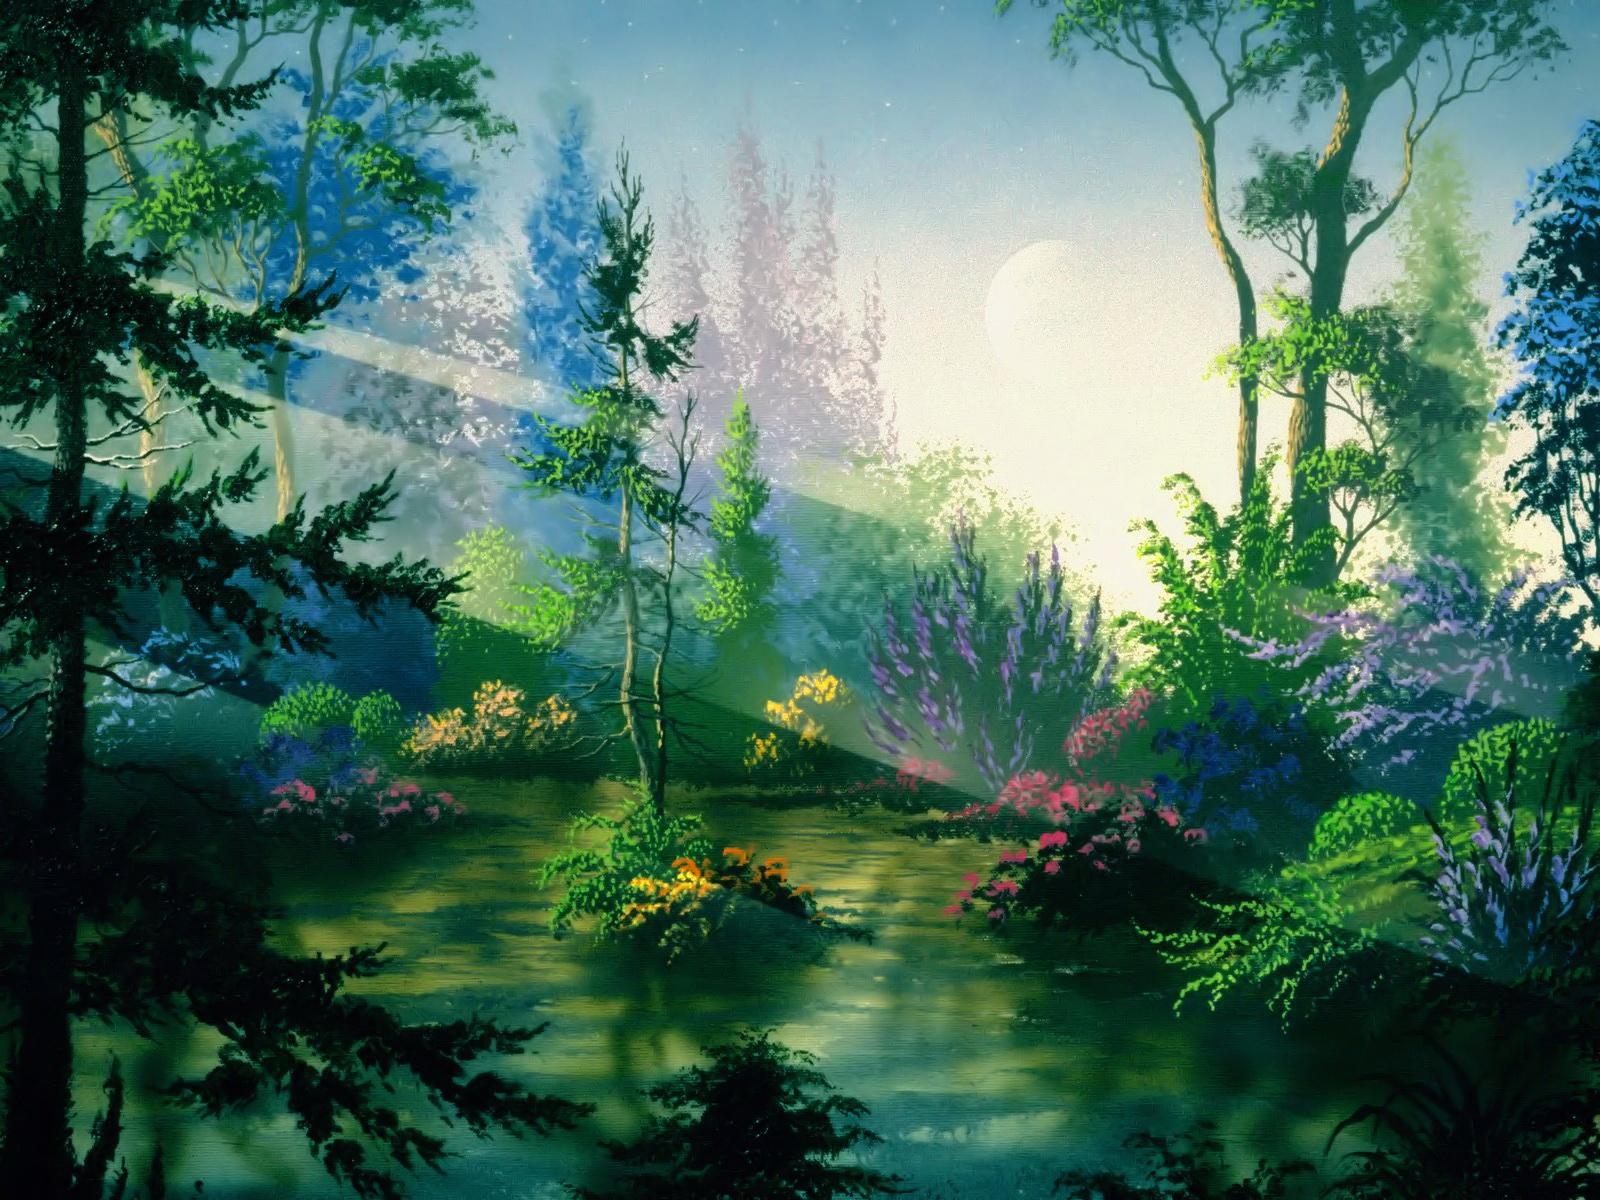 Fantasy Wallpaper Fantasy Pictures Fantasy Images amp Photos 1600x1200